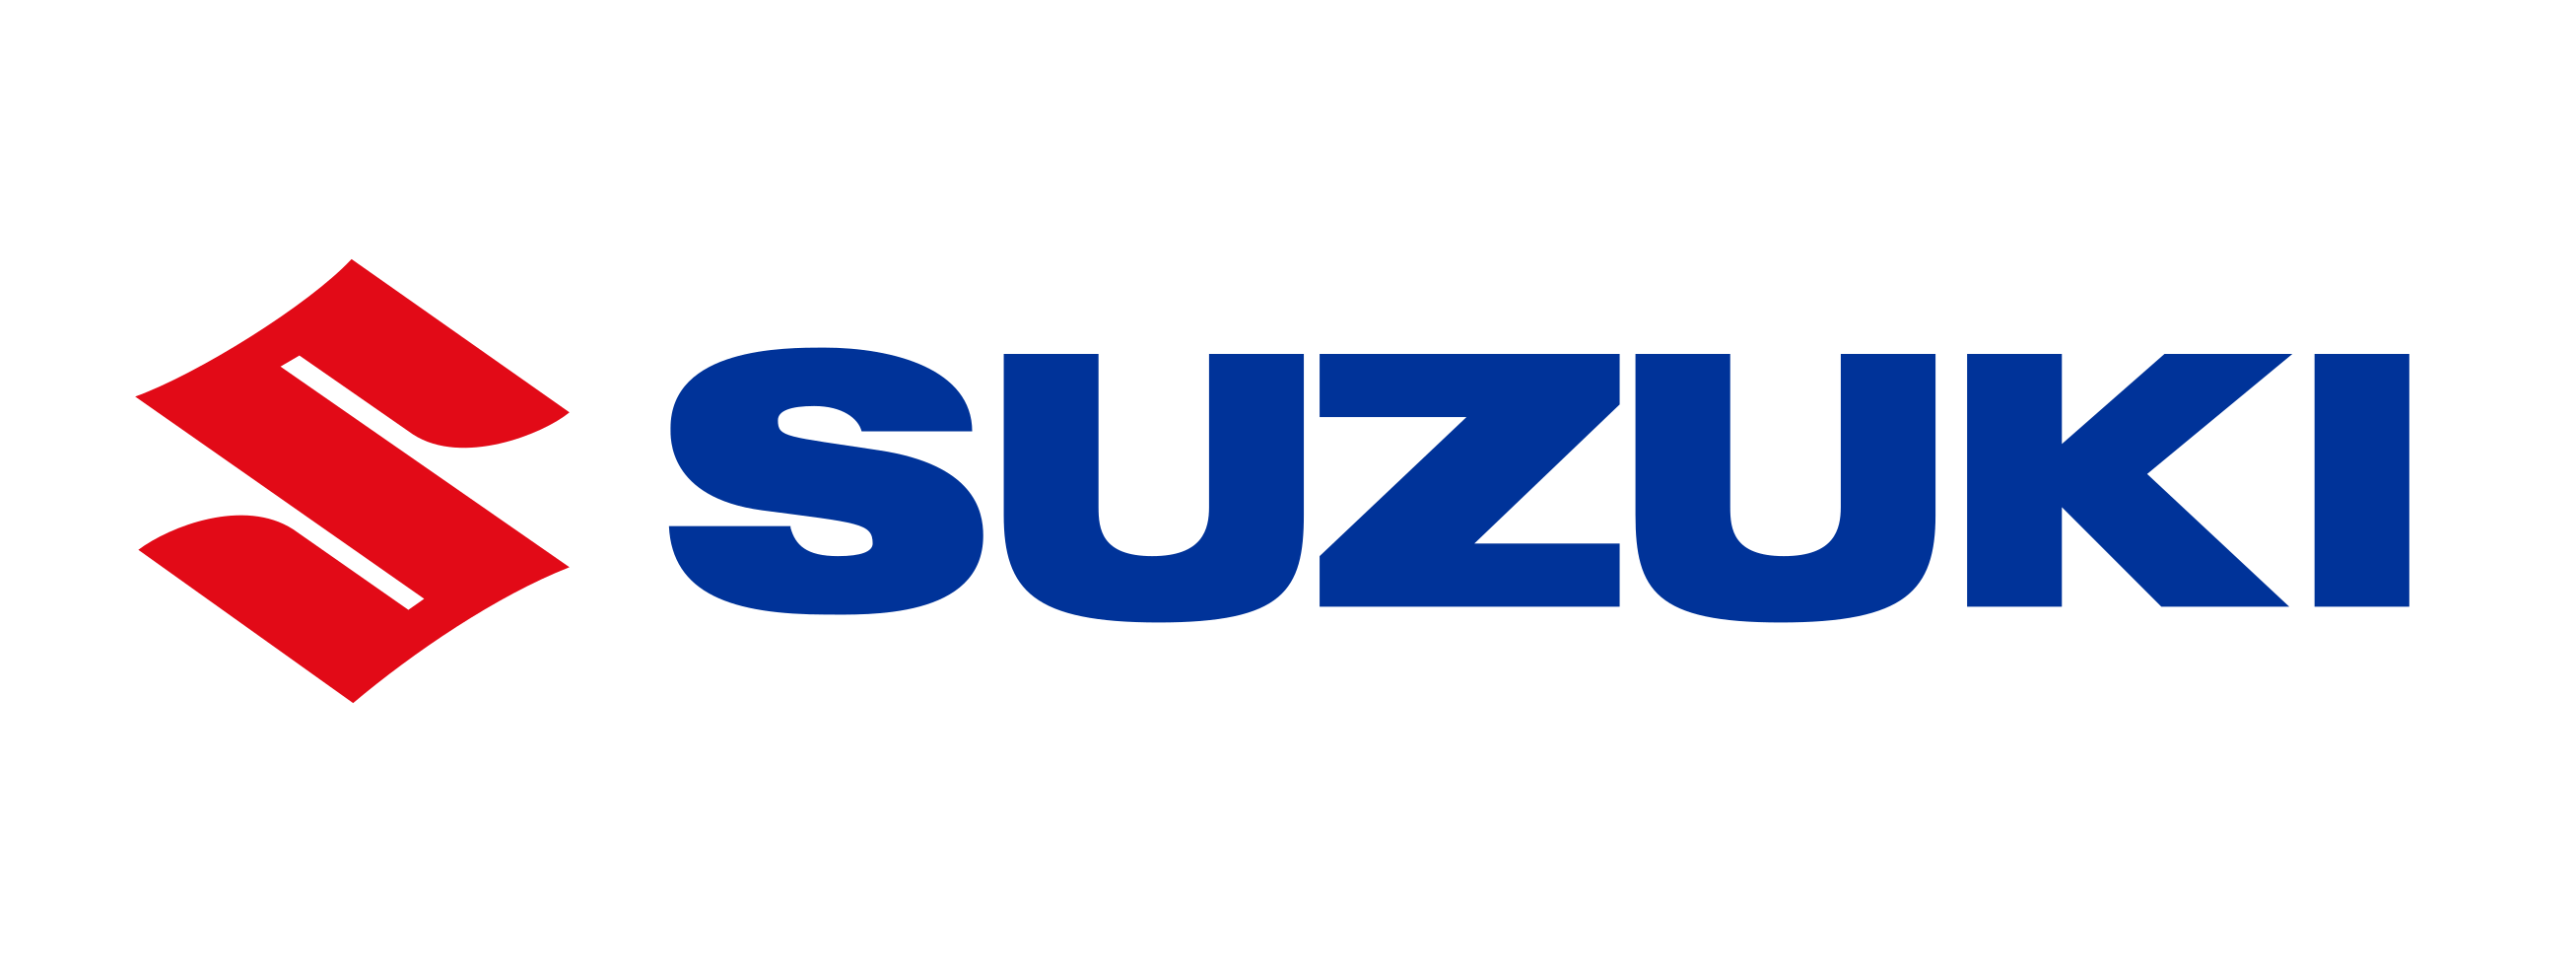 https://suzukicycles.com/